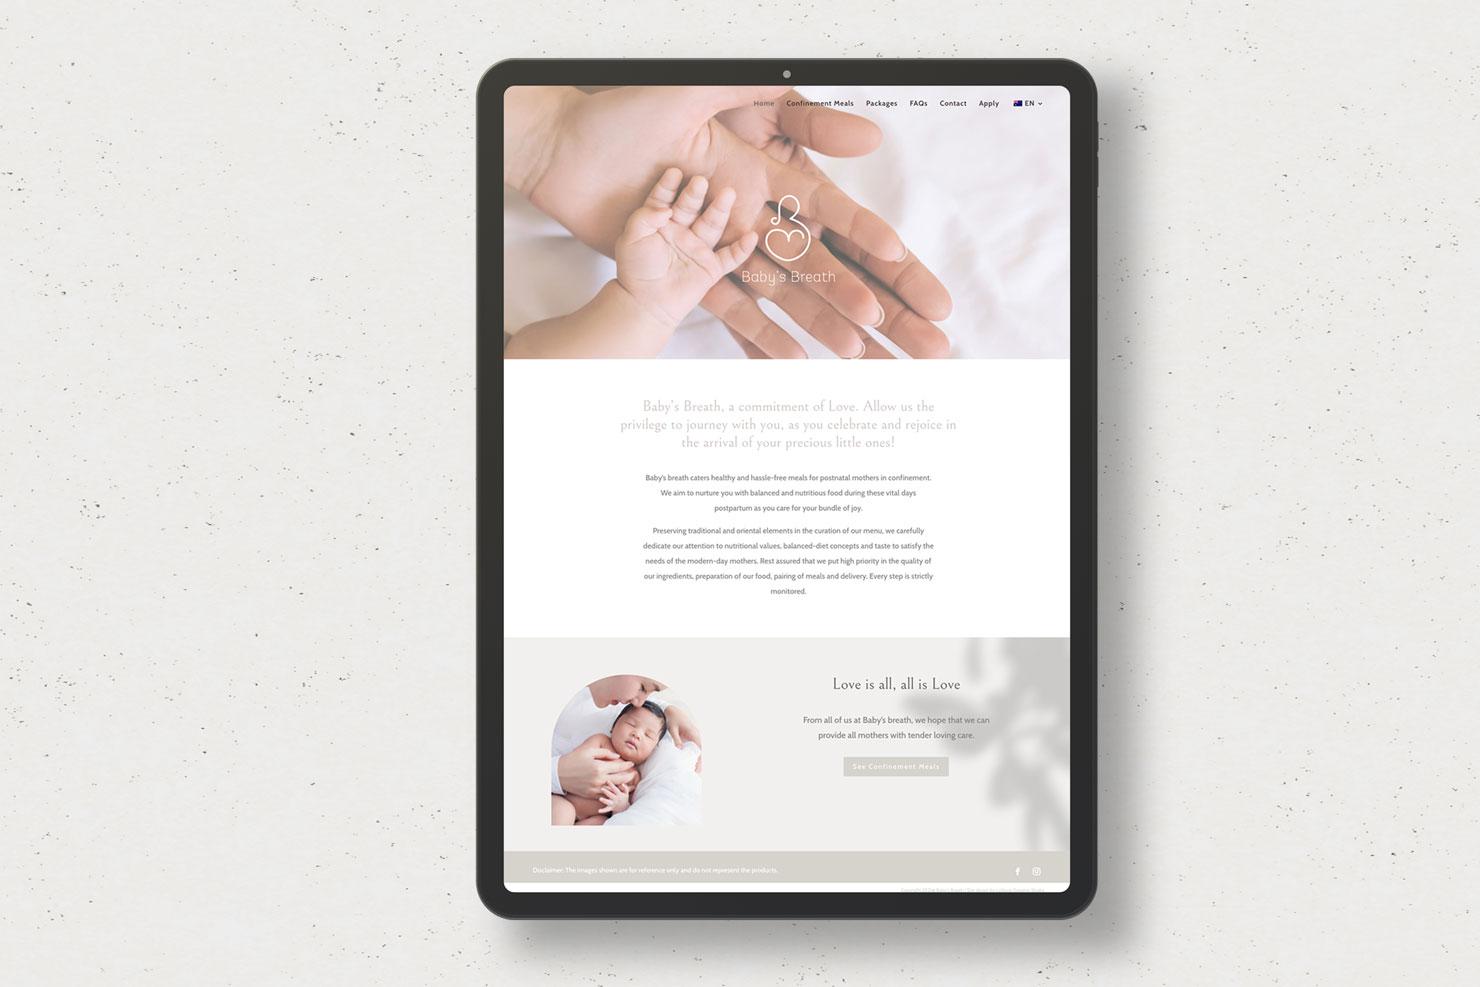 babys breath health confinement meal website design